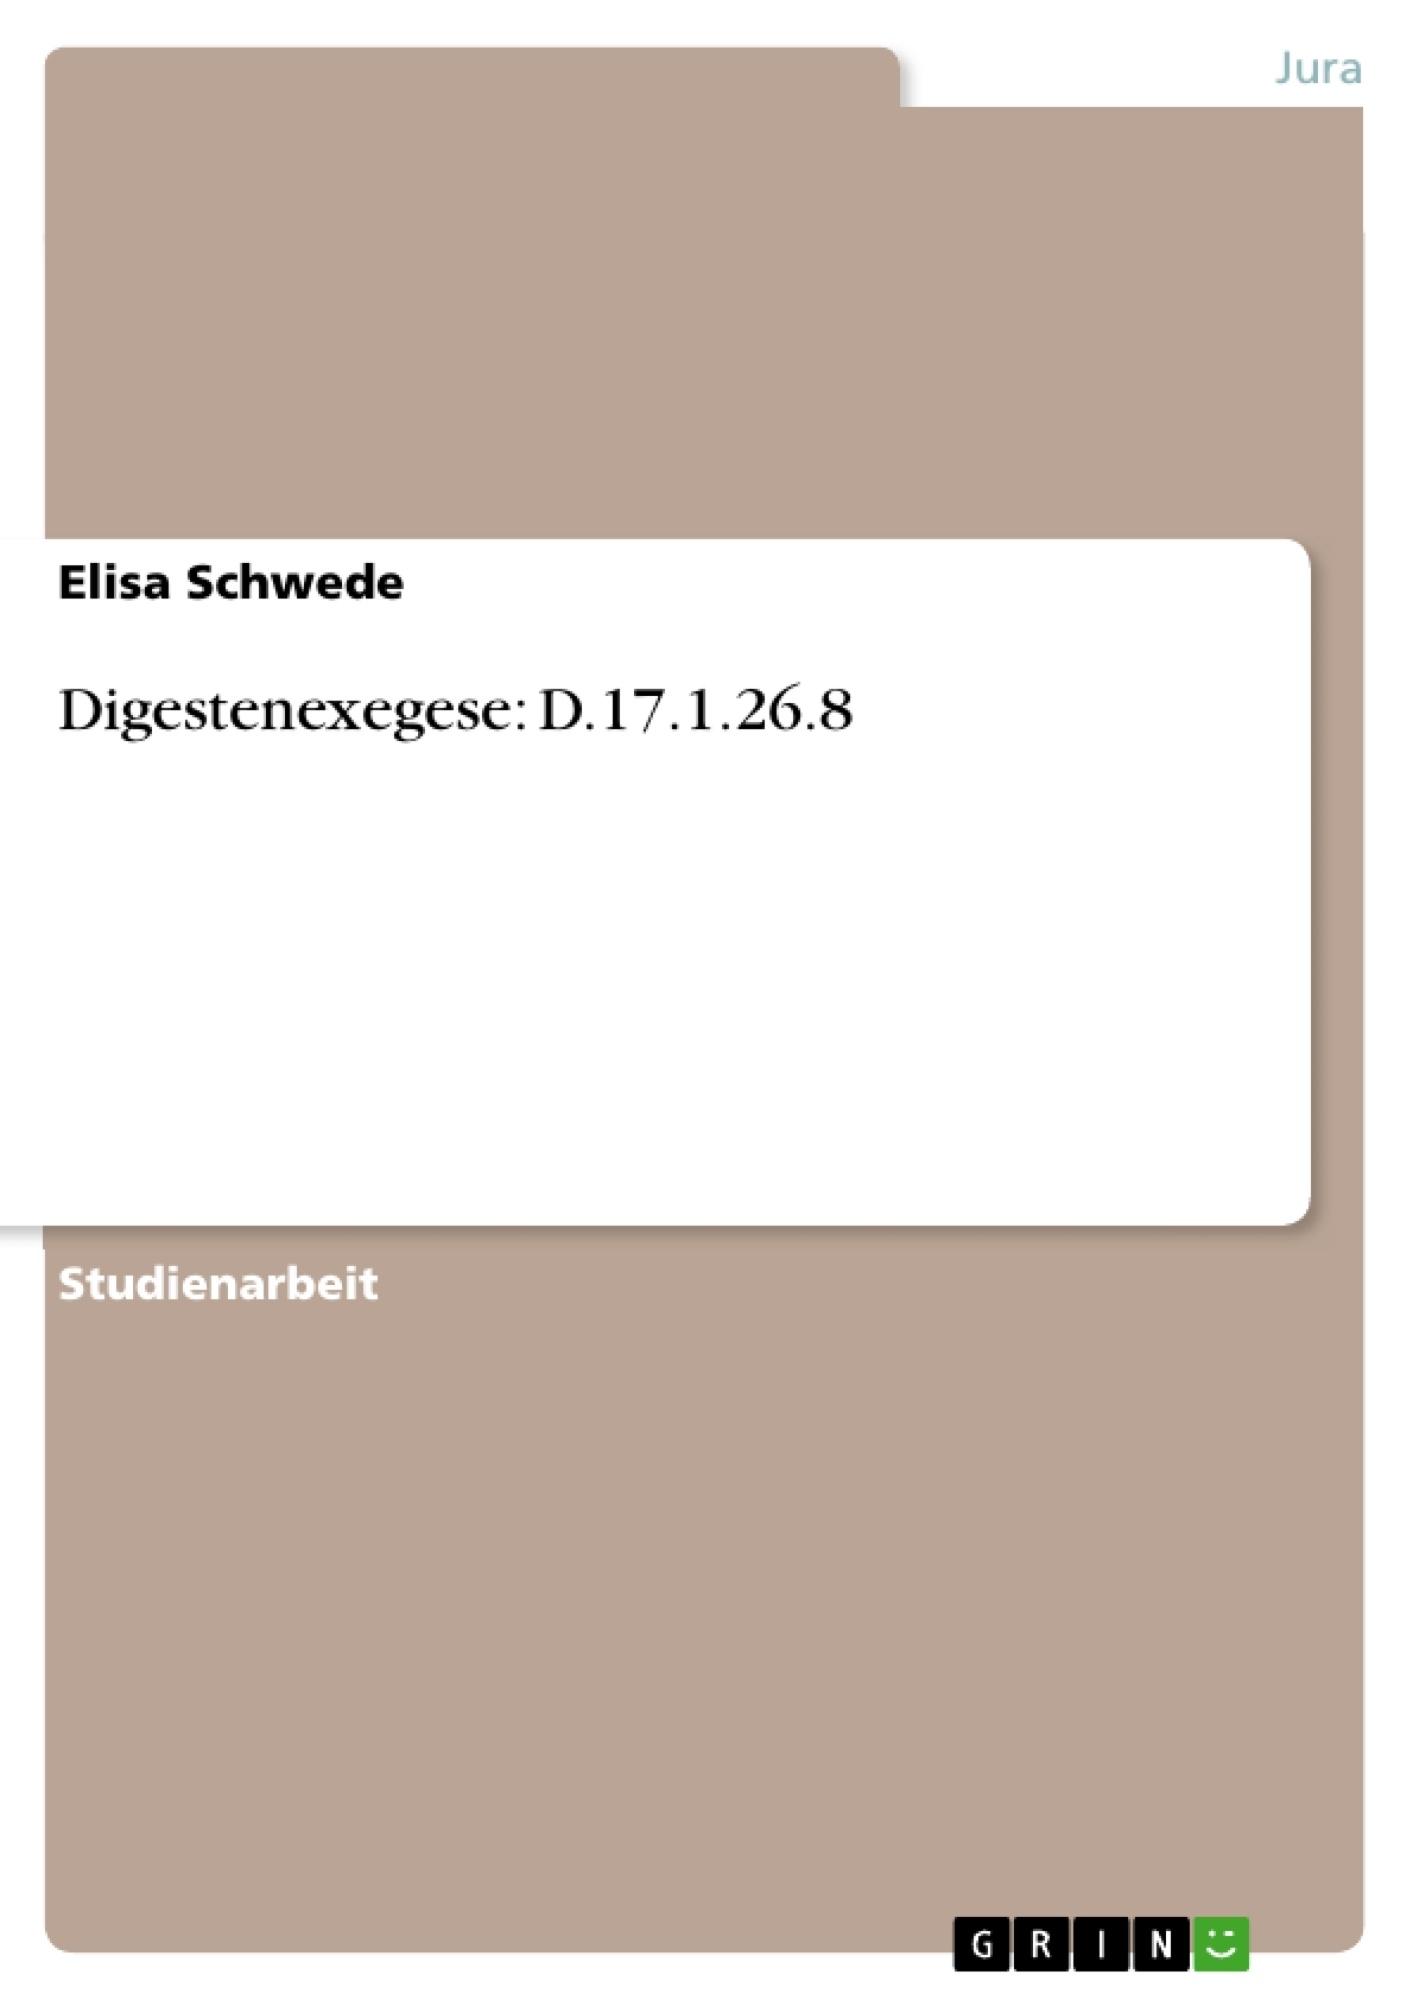 Titel: Digestenexegese: D.17.1.26.8